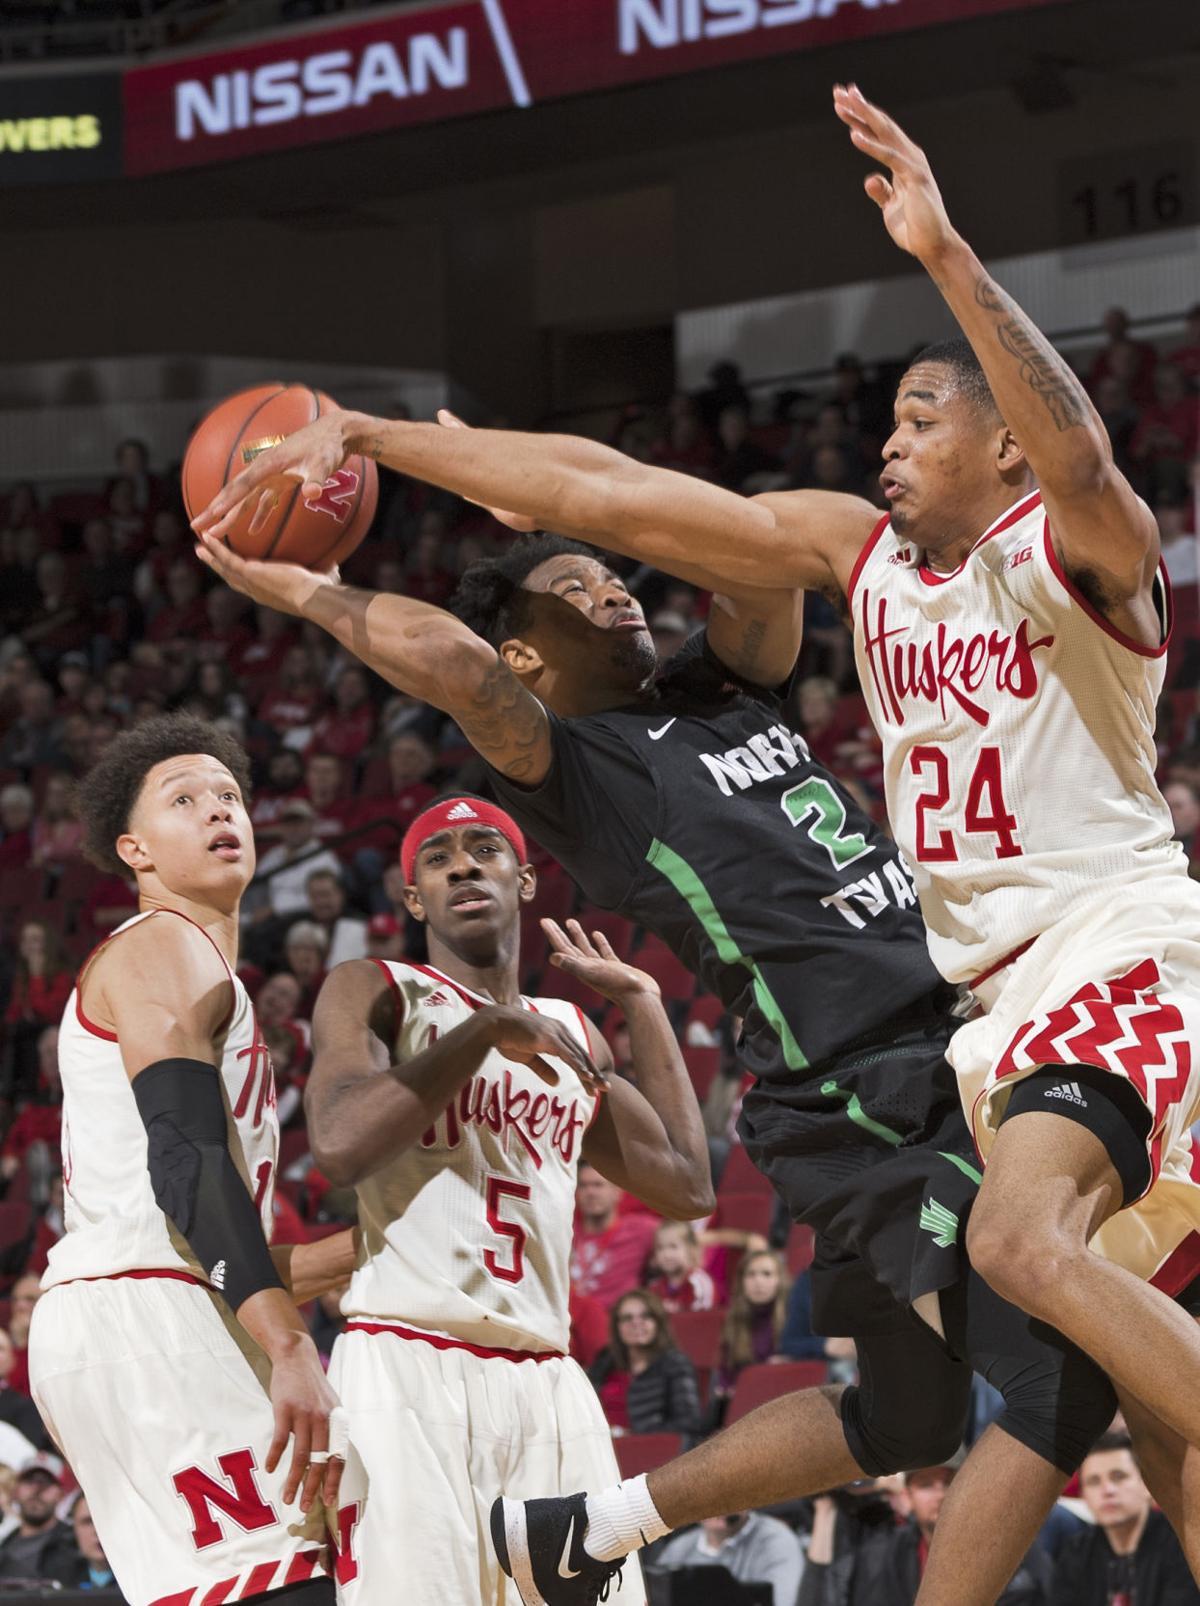 North Texas vs. Nebraska basketball, 11/13/17